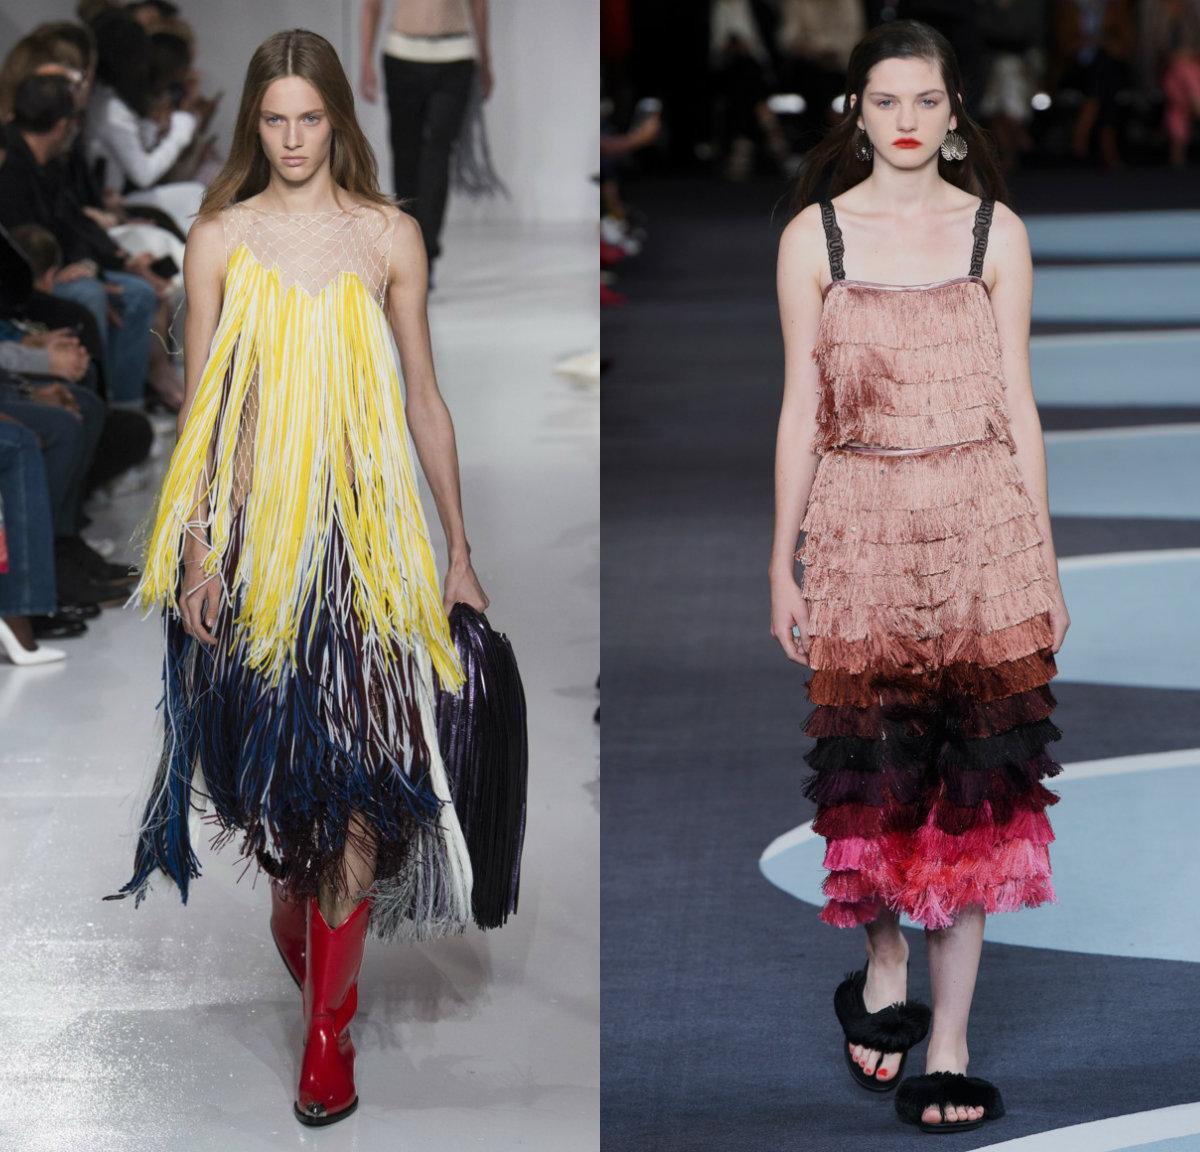 женская мода 2018: авангардные модели